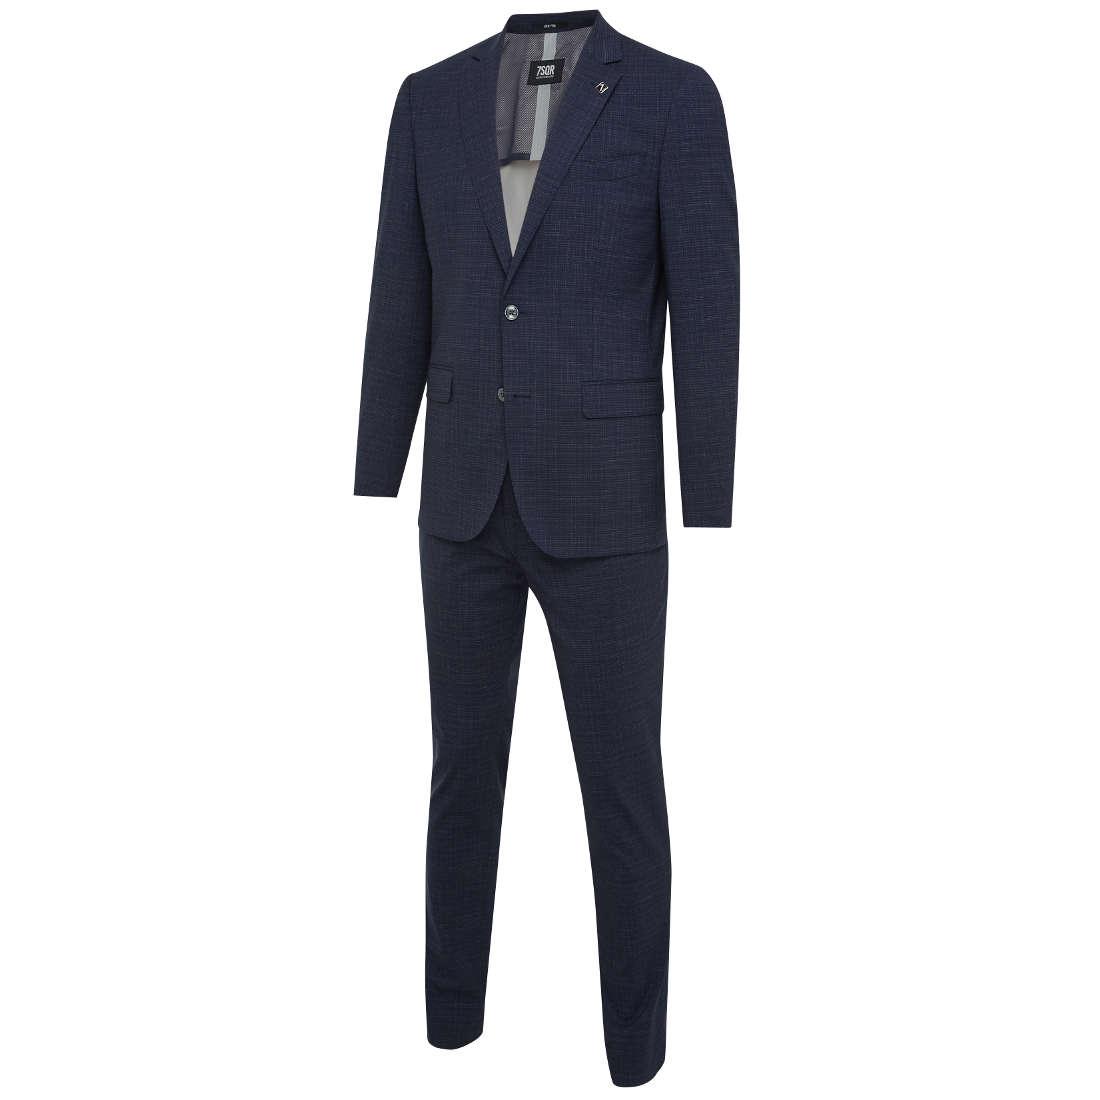 Smit Mode:  7Square kostuum 21026802 203023 in het Donker Blauw